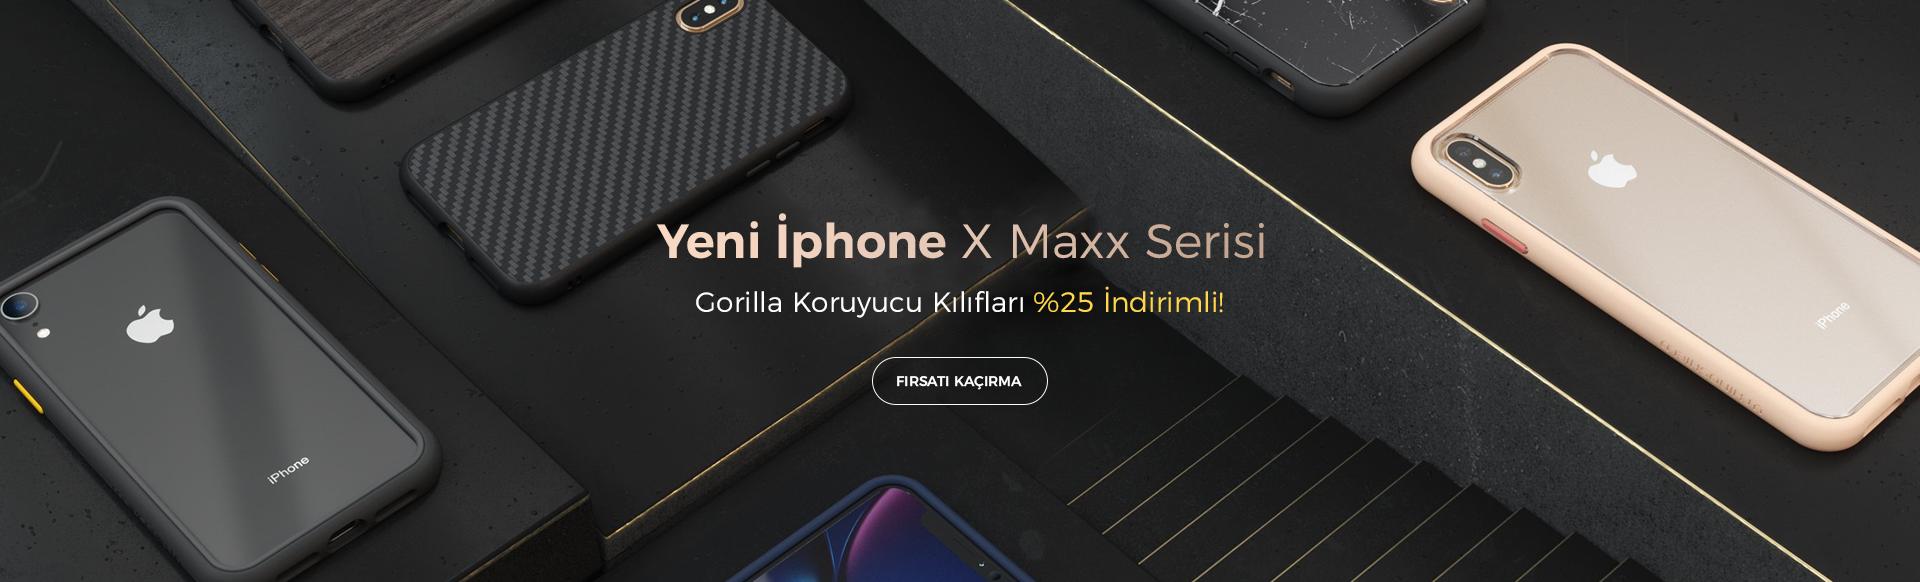 Yeni iPhone X